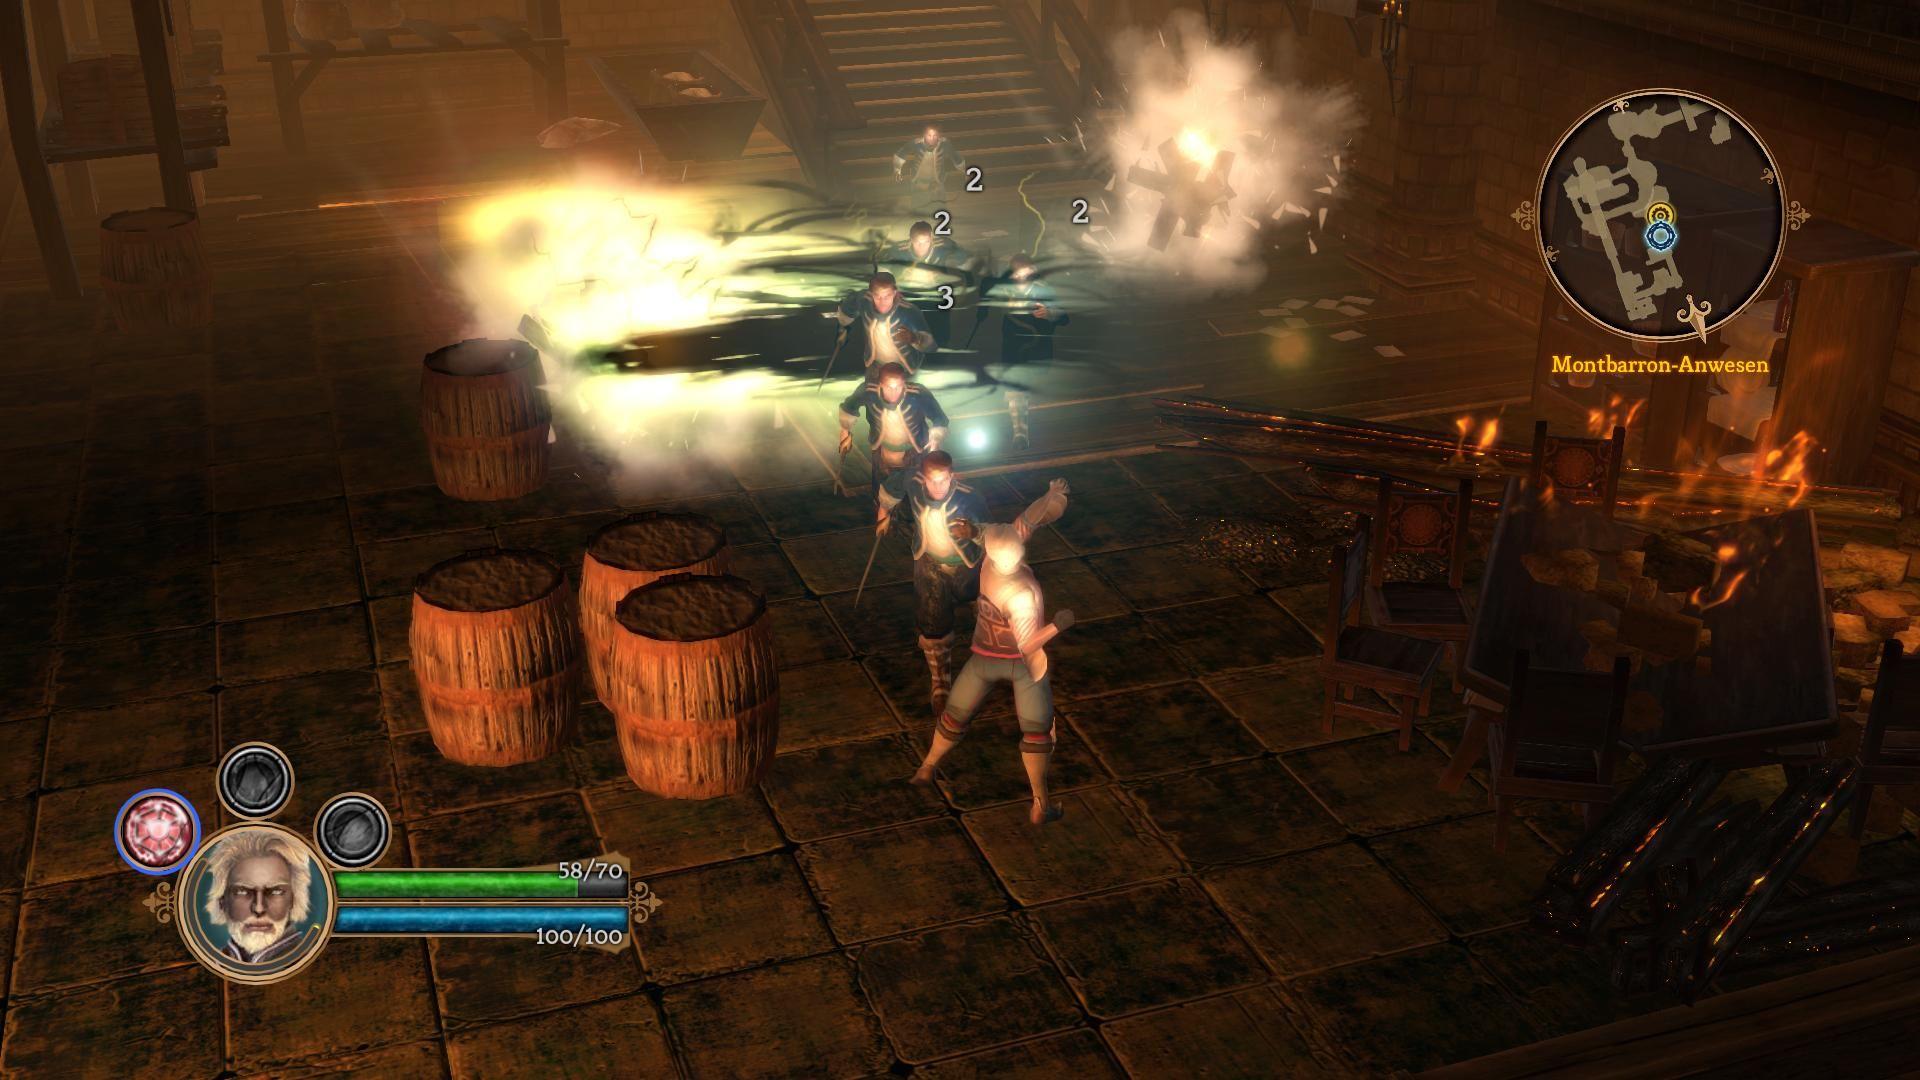 Dungeon siege 3 hentia erotic scene